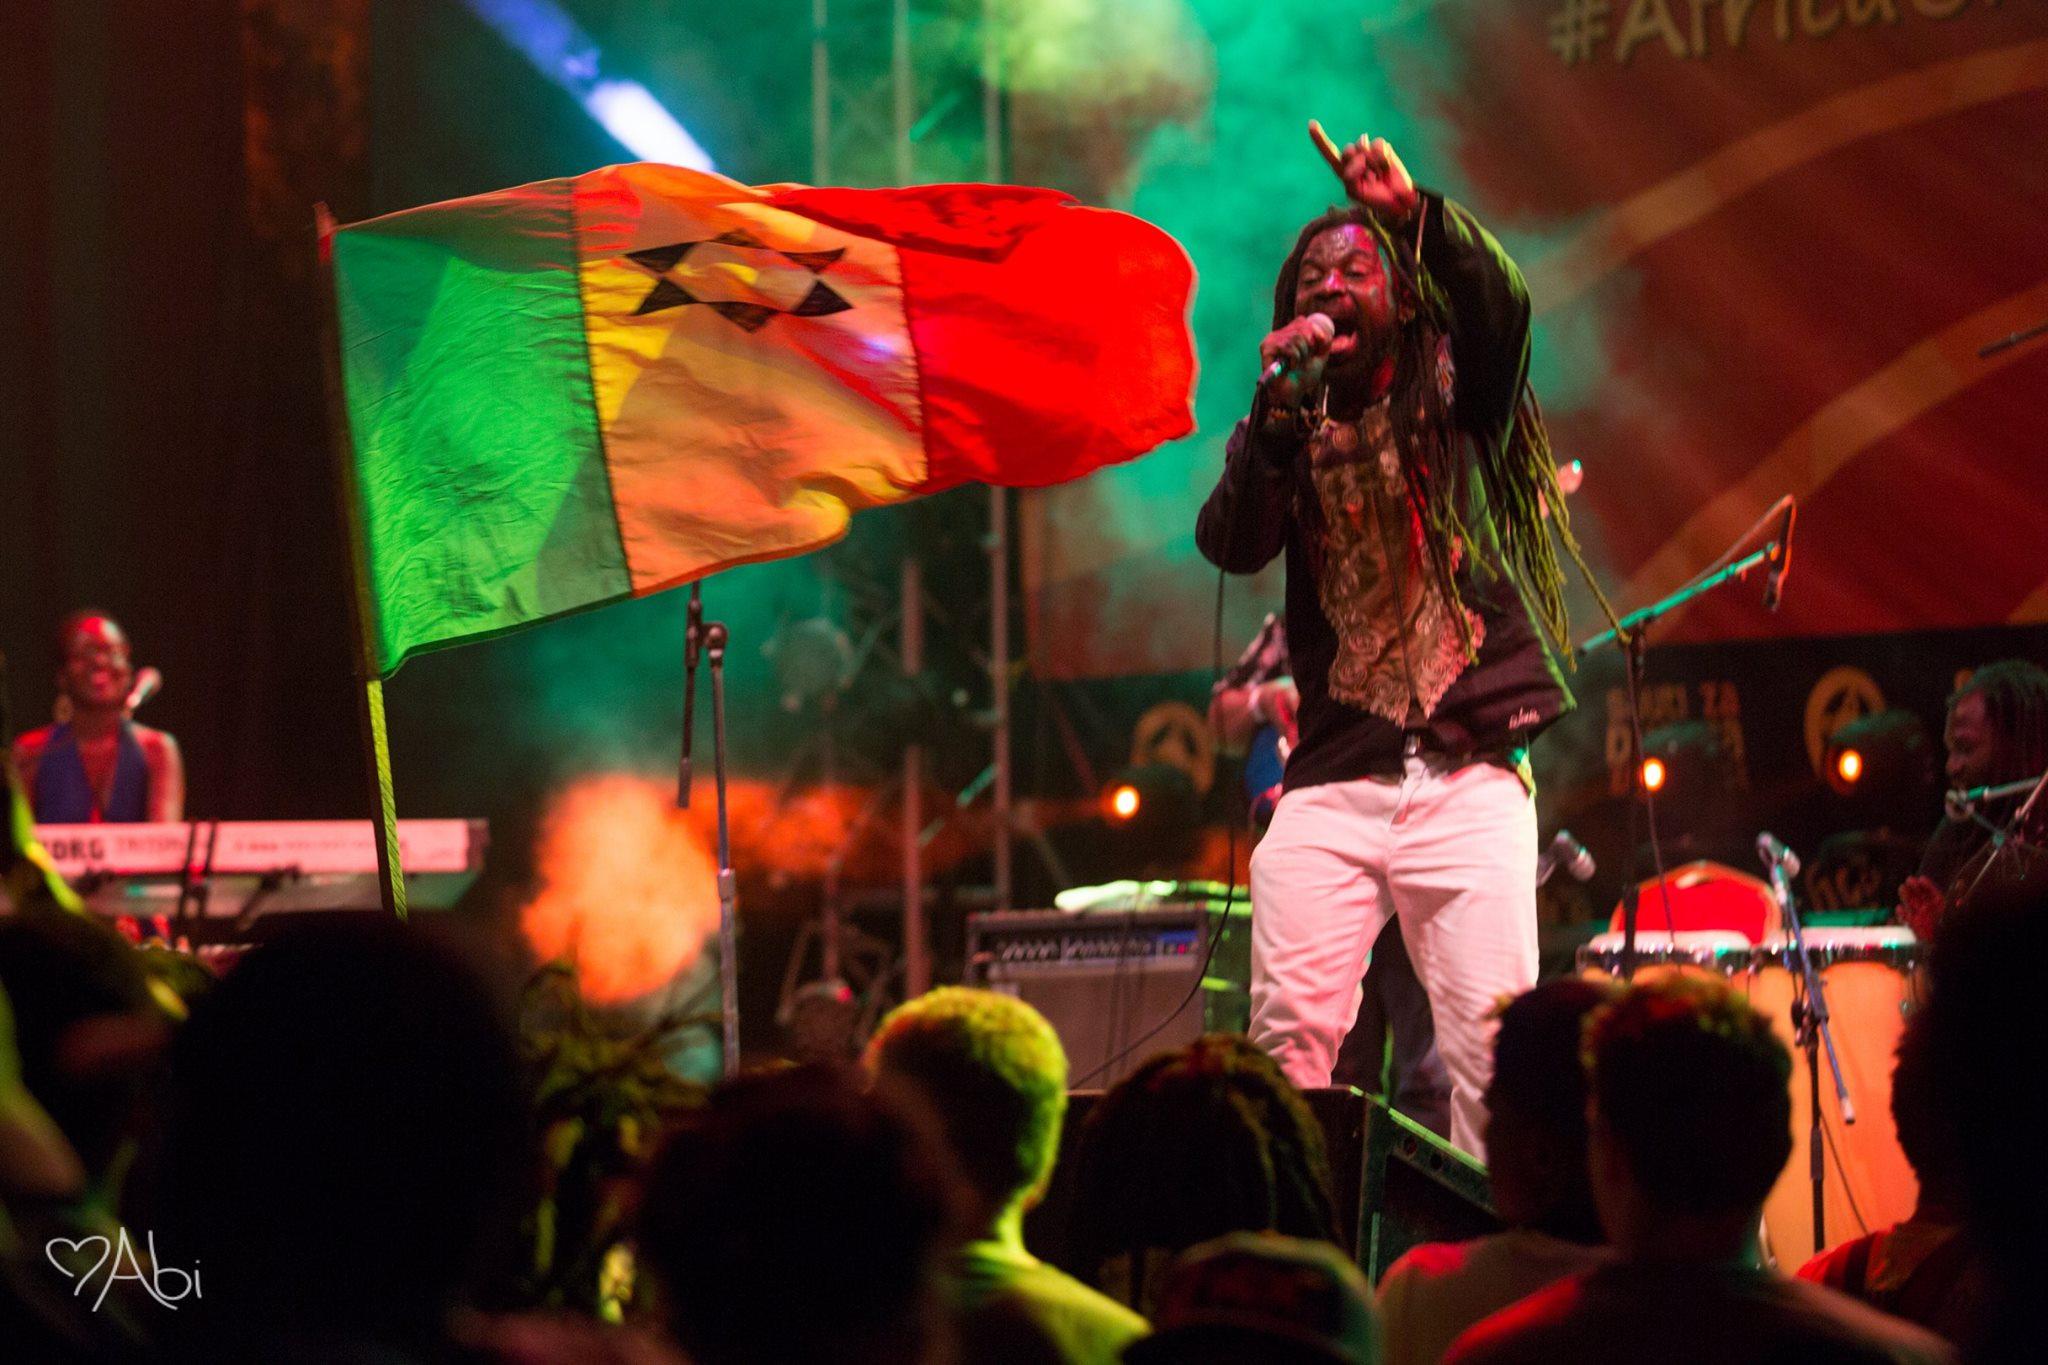 Rocky Dawuni LIVE at Teragram Ballroom in Los Angeles August 16!